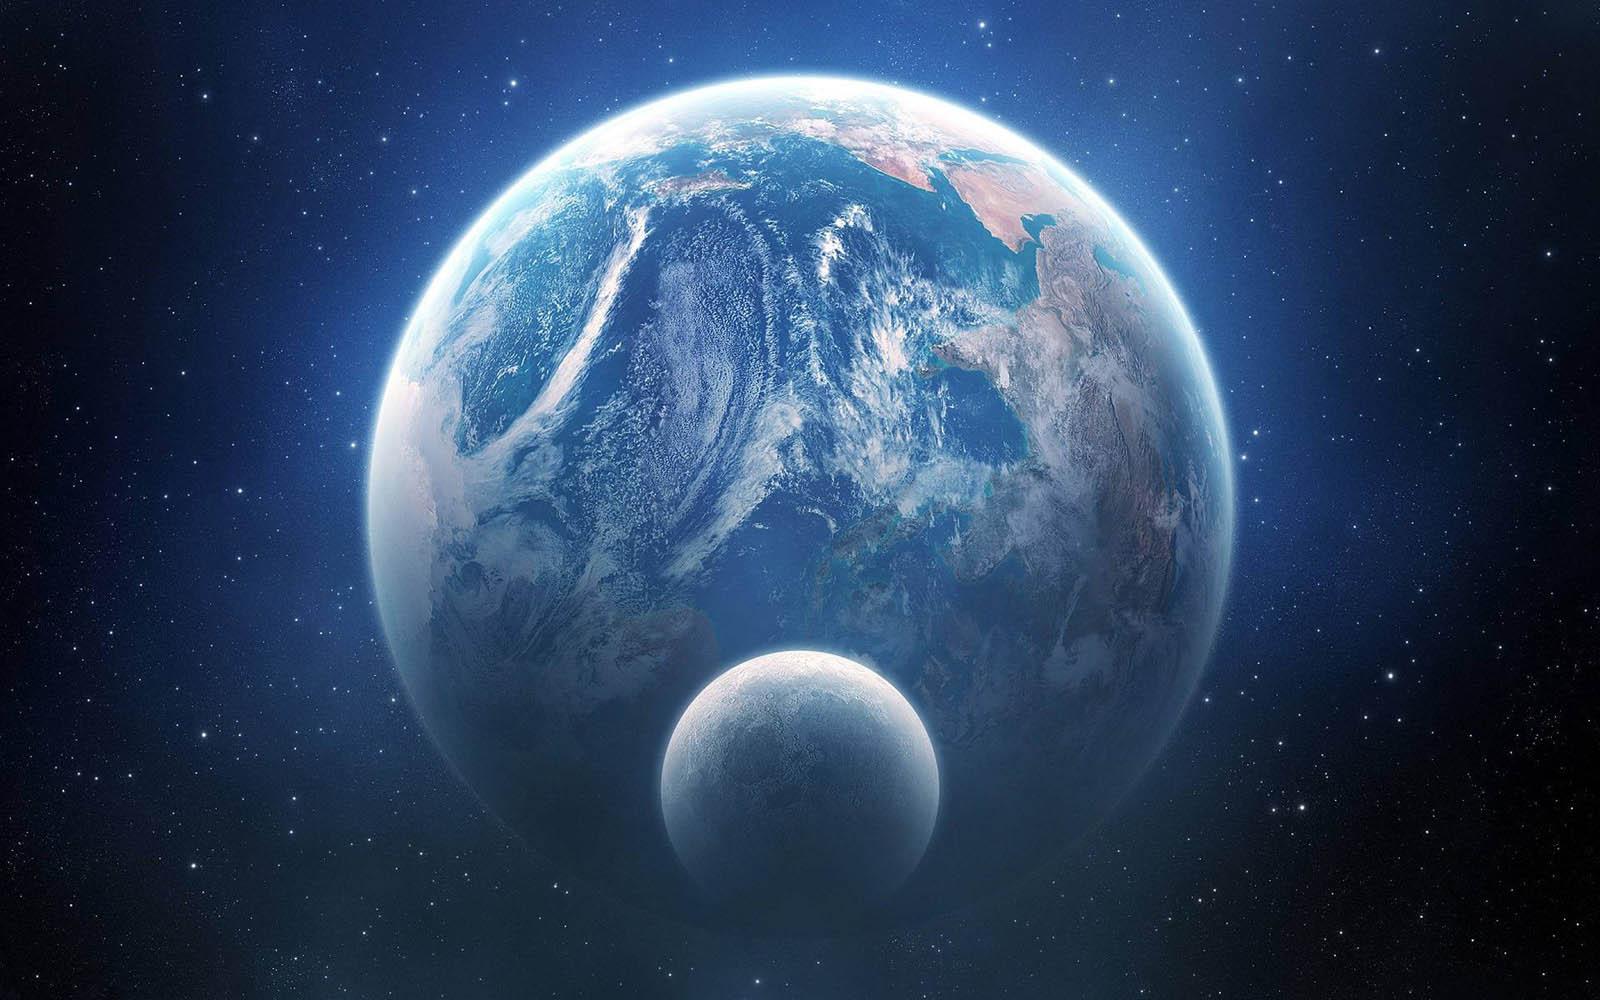 EarthAndMoonWallpapers01 Earth And Moon Wallpapers 1600x1000